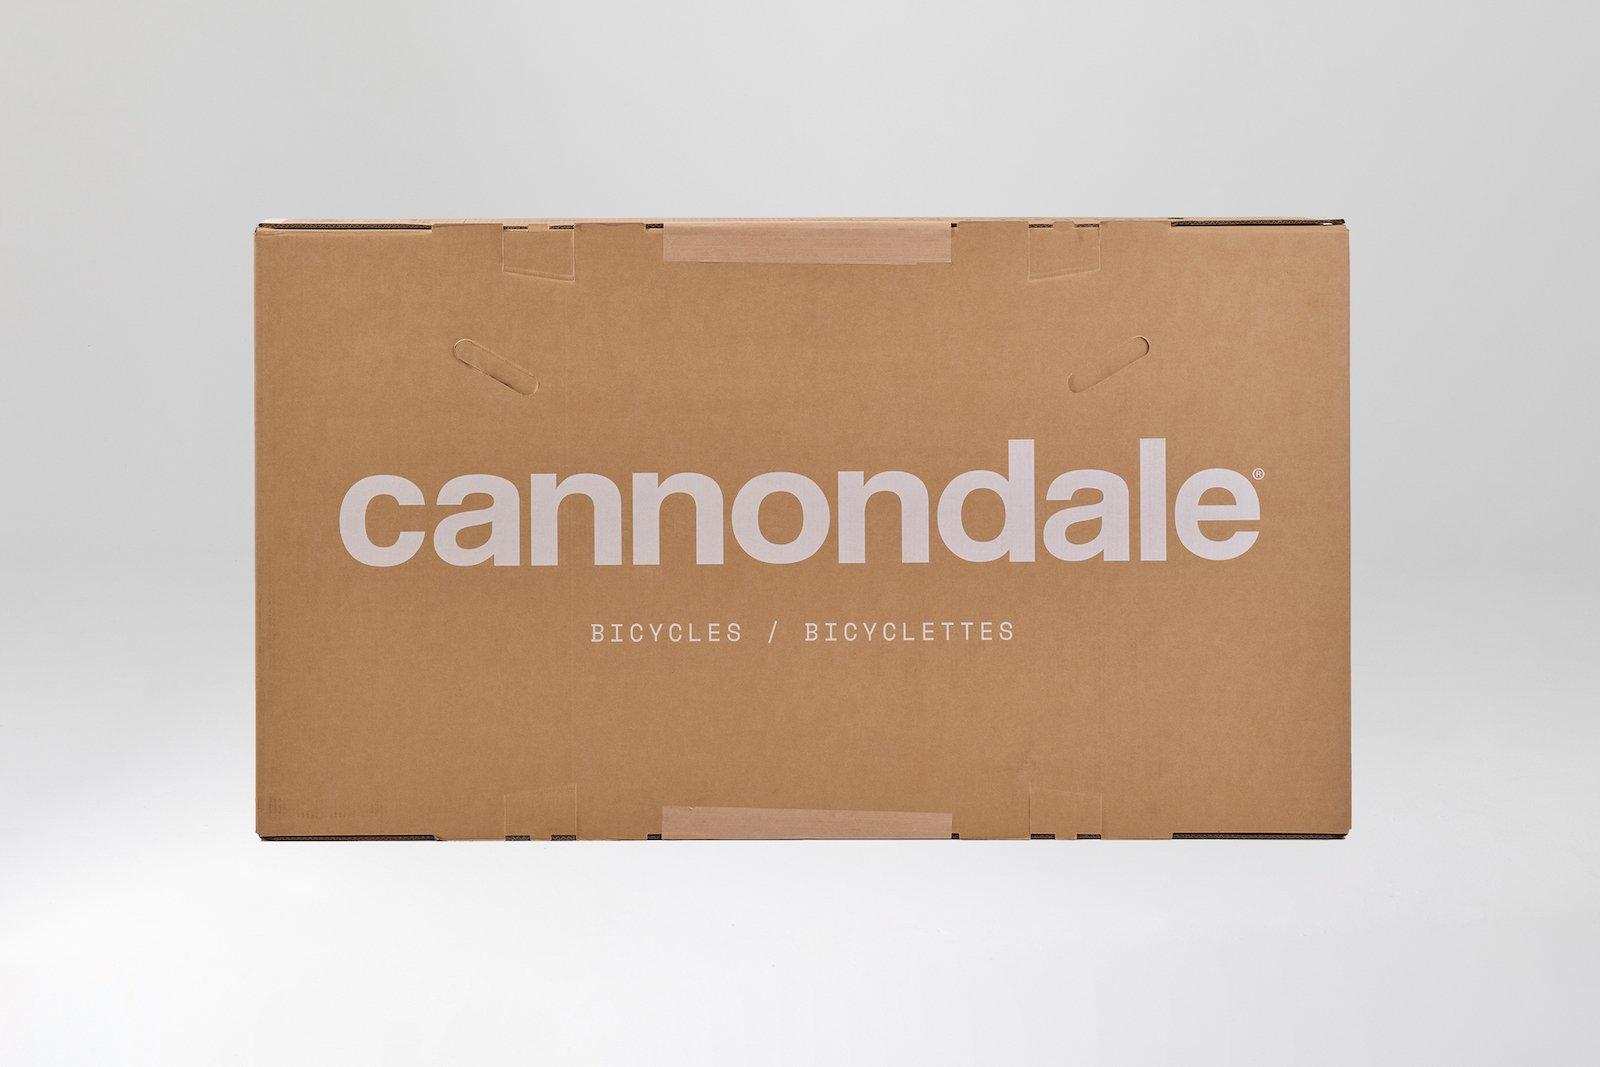 Imballaggi 100% riciclabili per le bici Cannondale